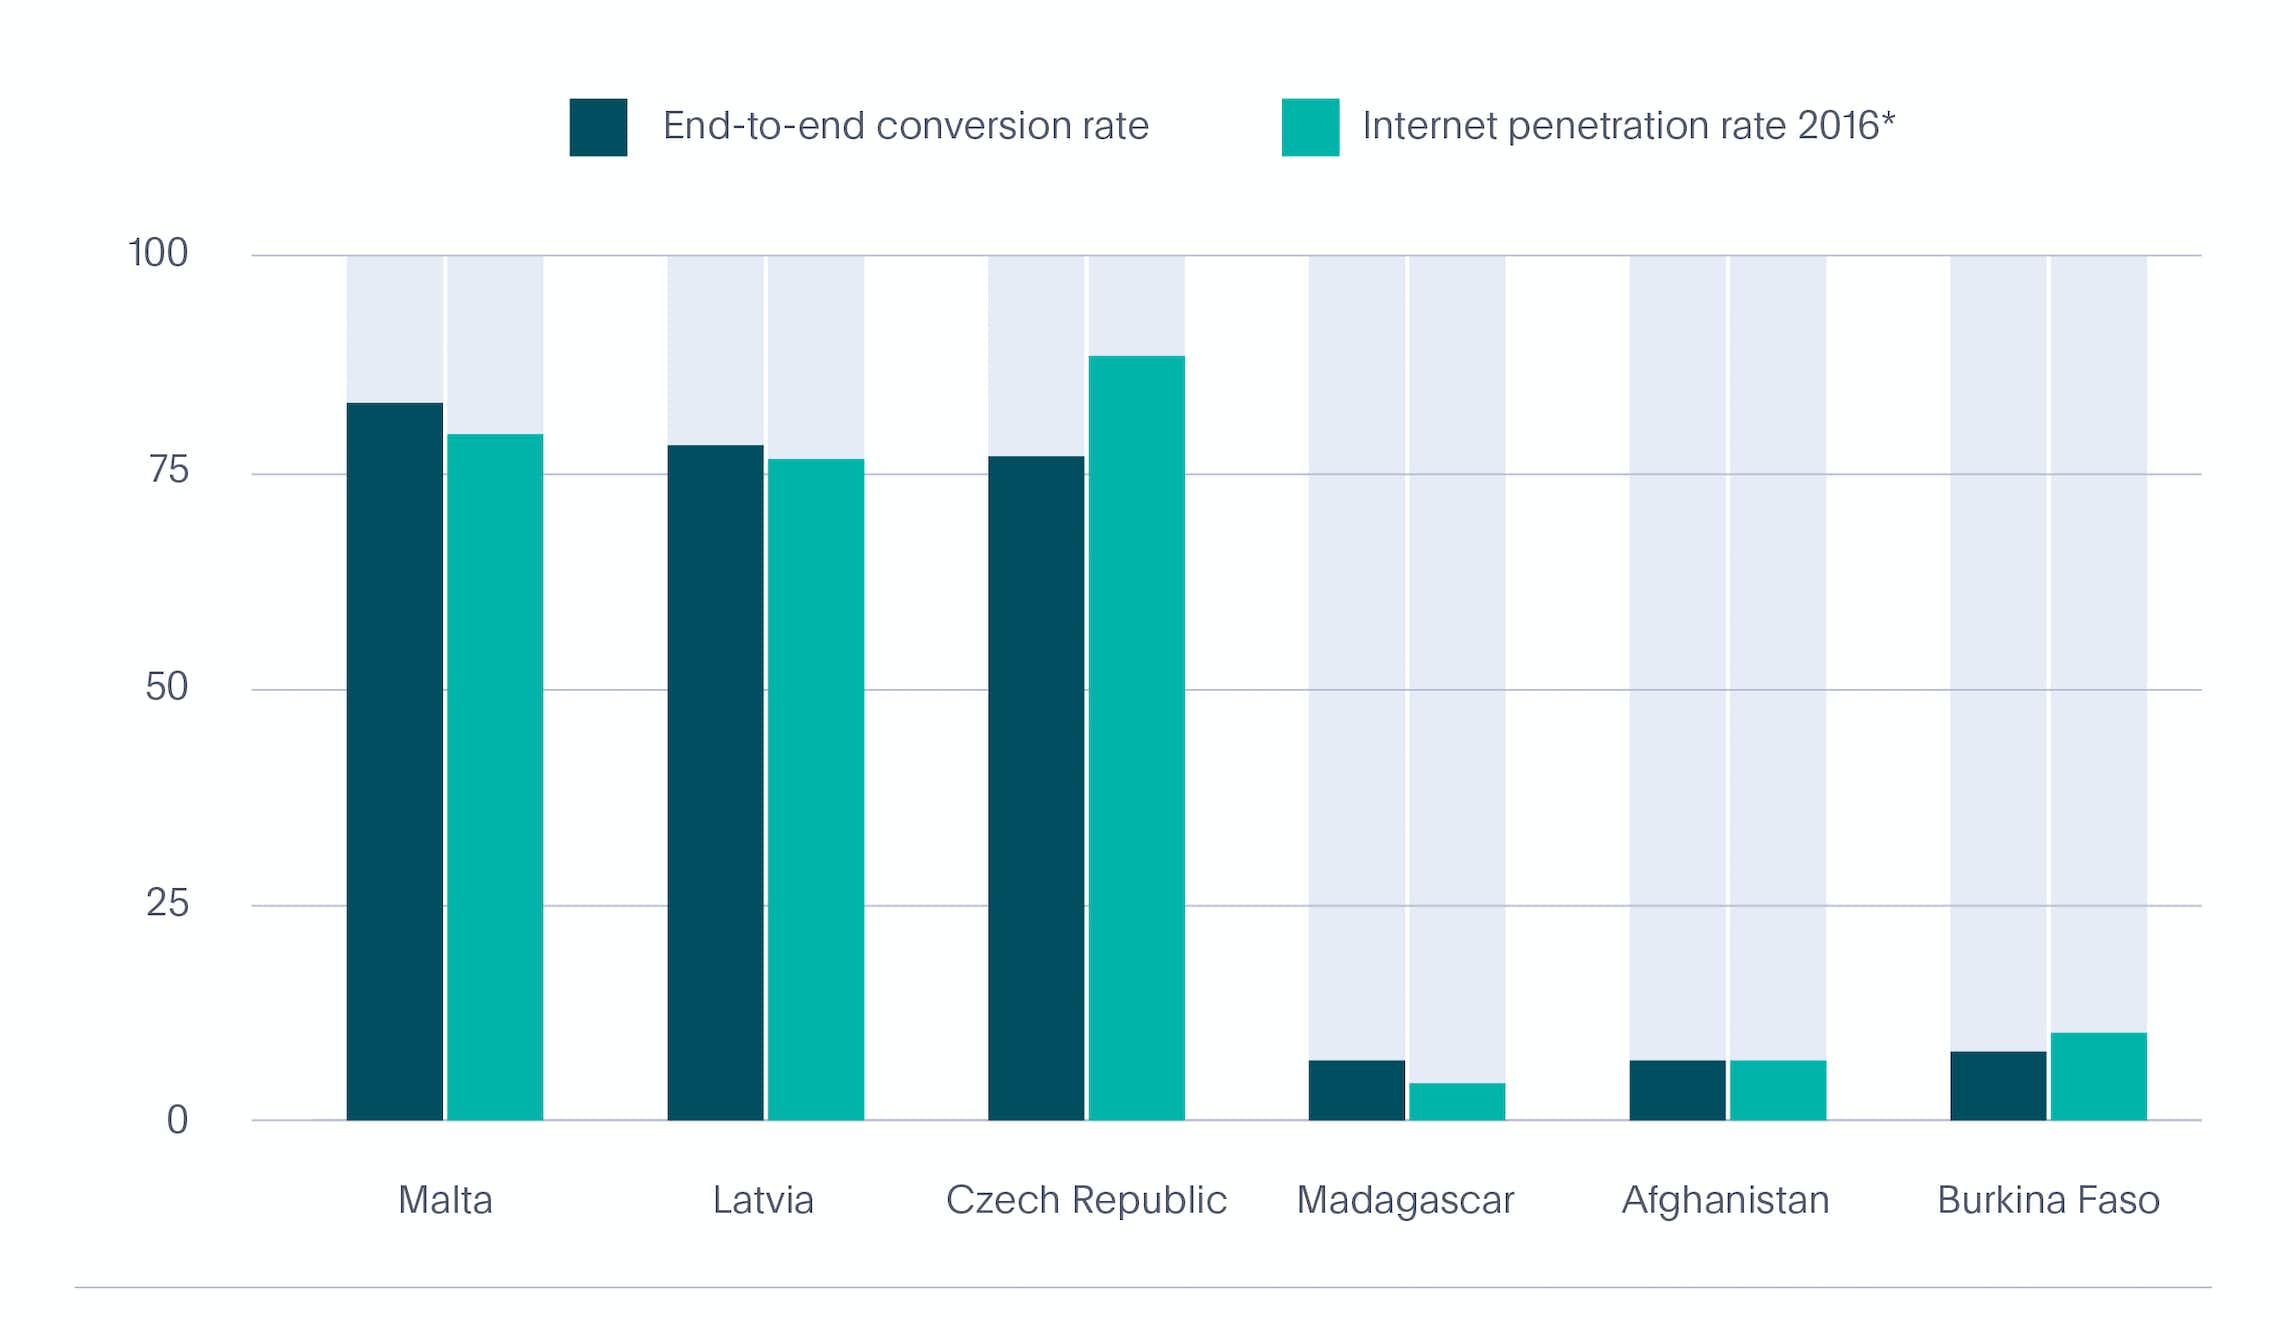 Identity verification conversions vs internet penetration rate